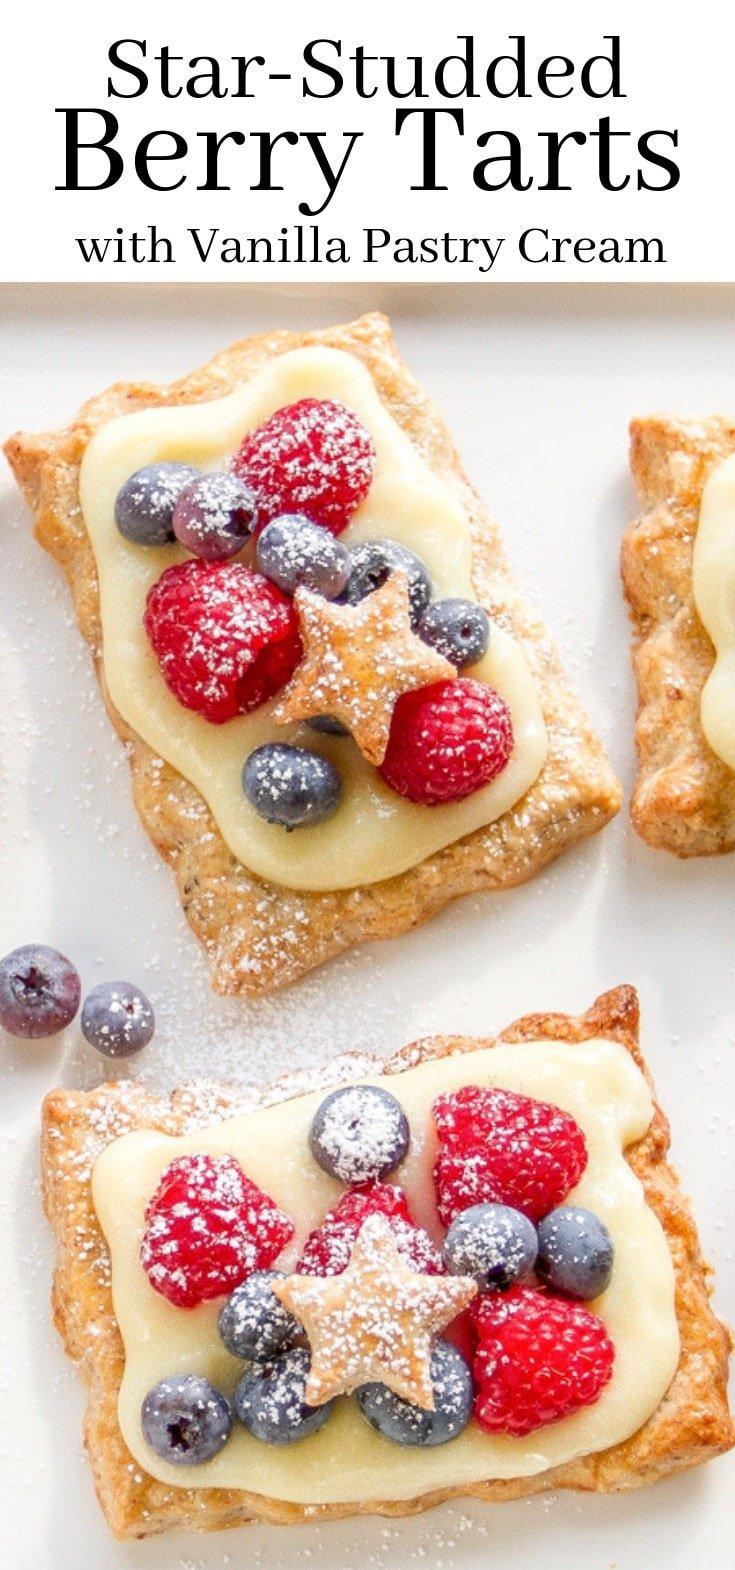 Flaky tarts with vanilla pastry cream and fresh summer berries